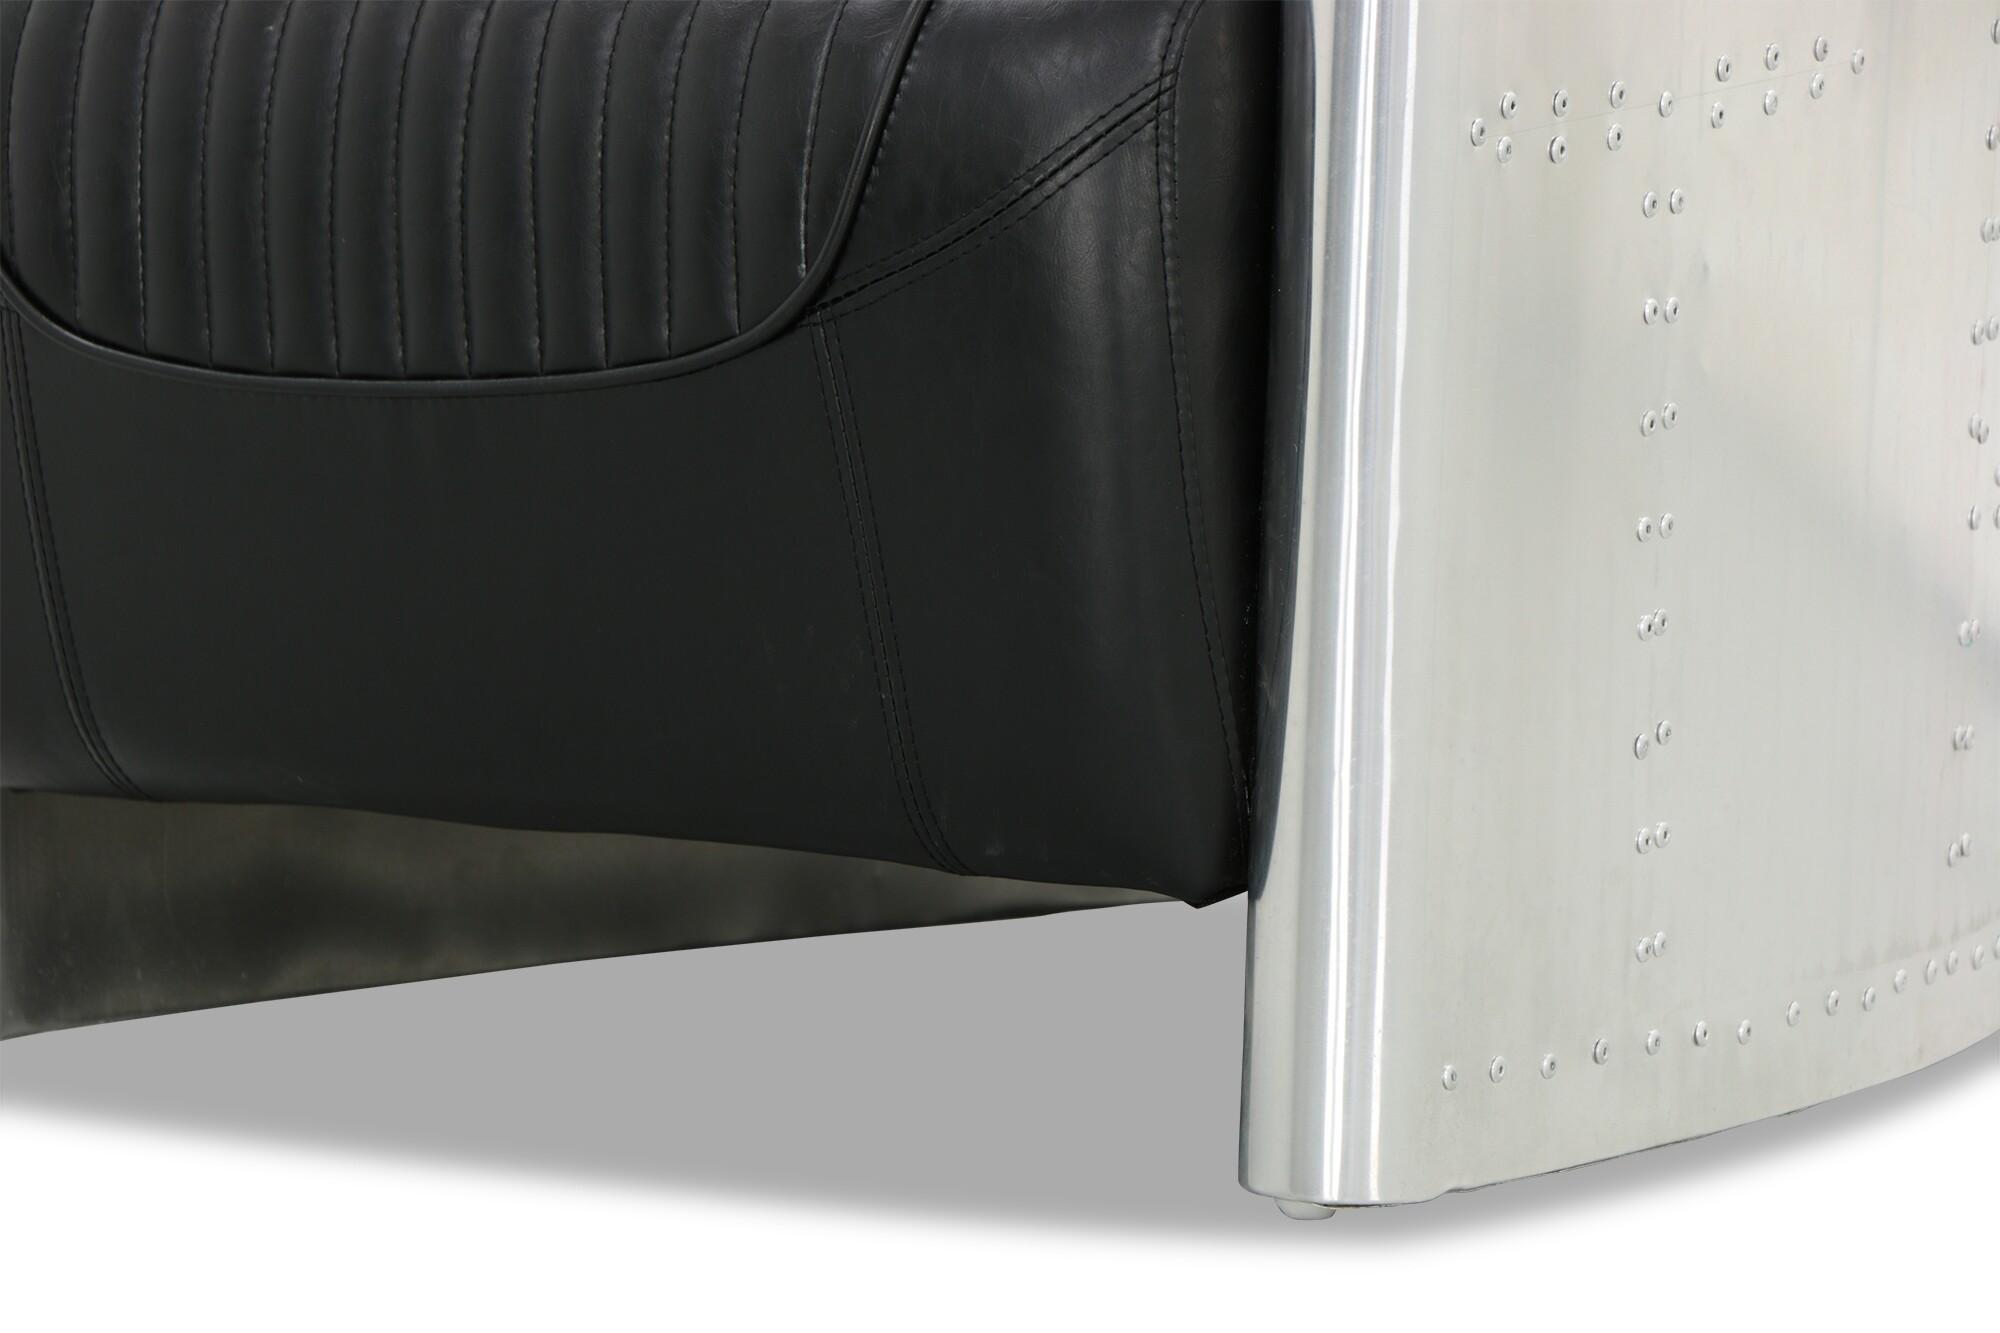 aviator chair replica serta office parts designer arm in black pu leather